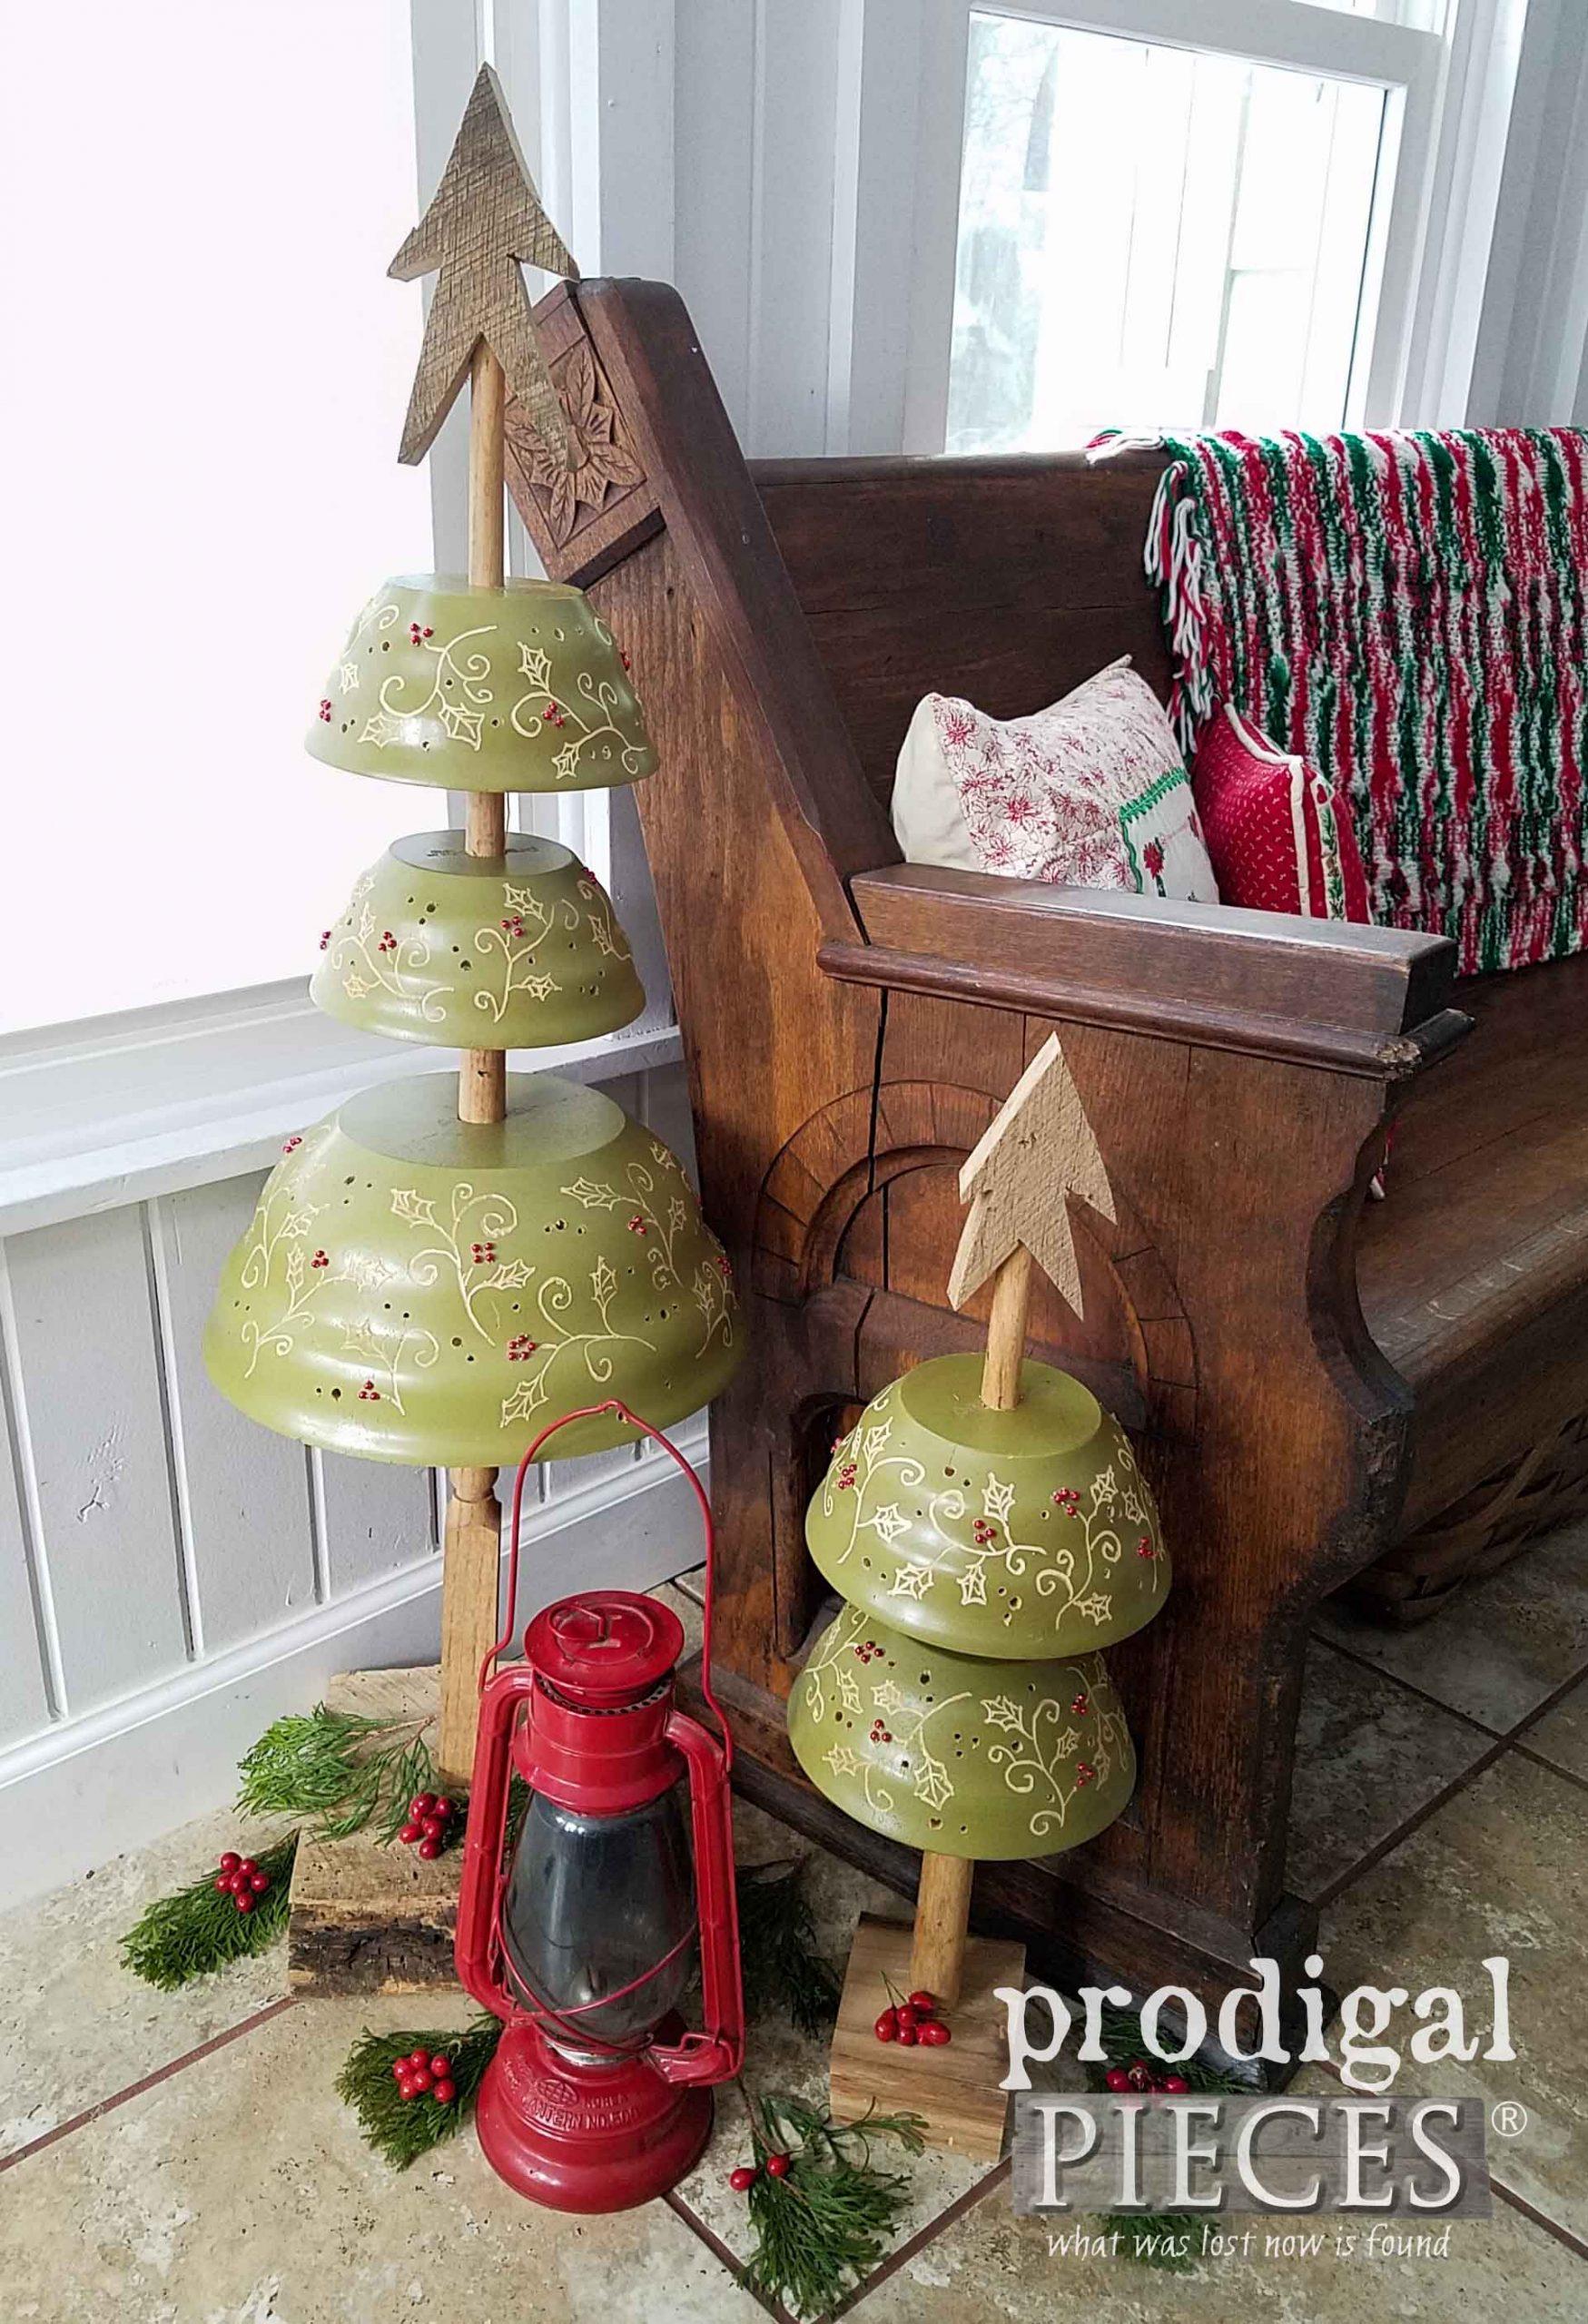 DIY Repurposed Christmas Tree  | www.raggedy-bits.com | #raggedybits #diy #christmas #farmhouse #vintage #repurpose #upcycle #prodigalpieces